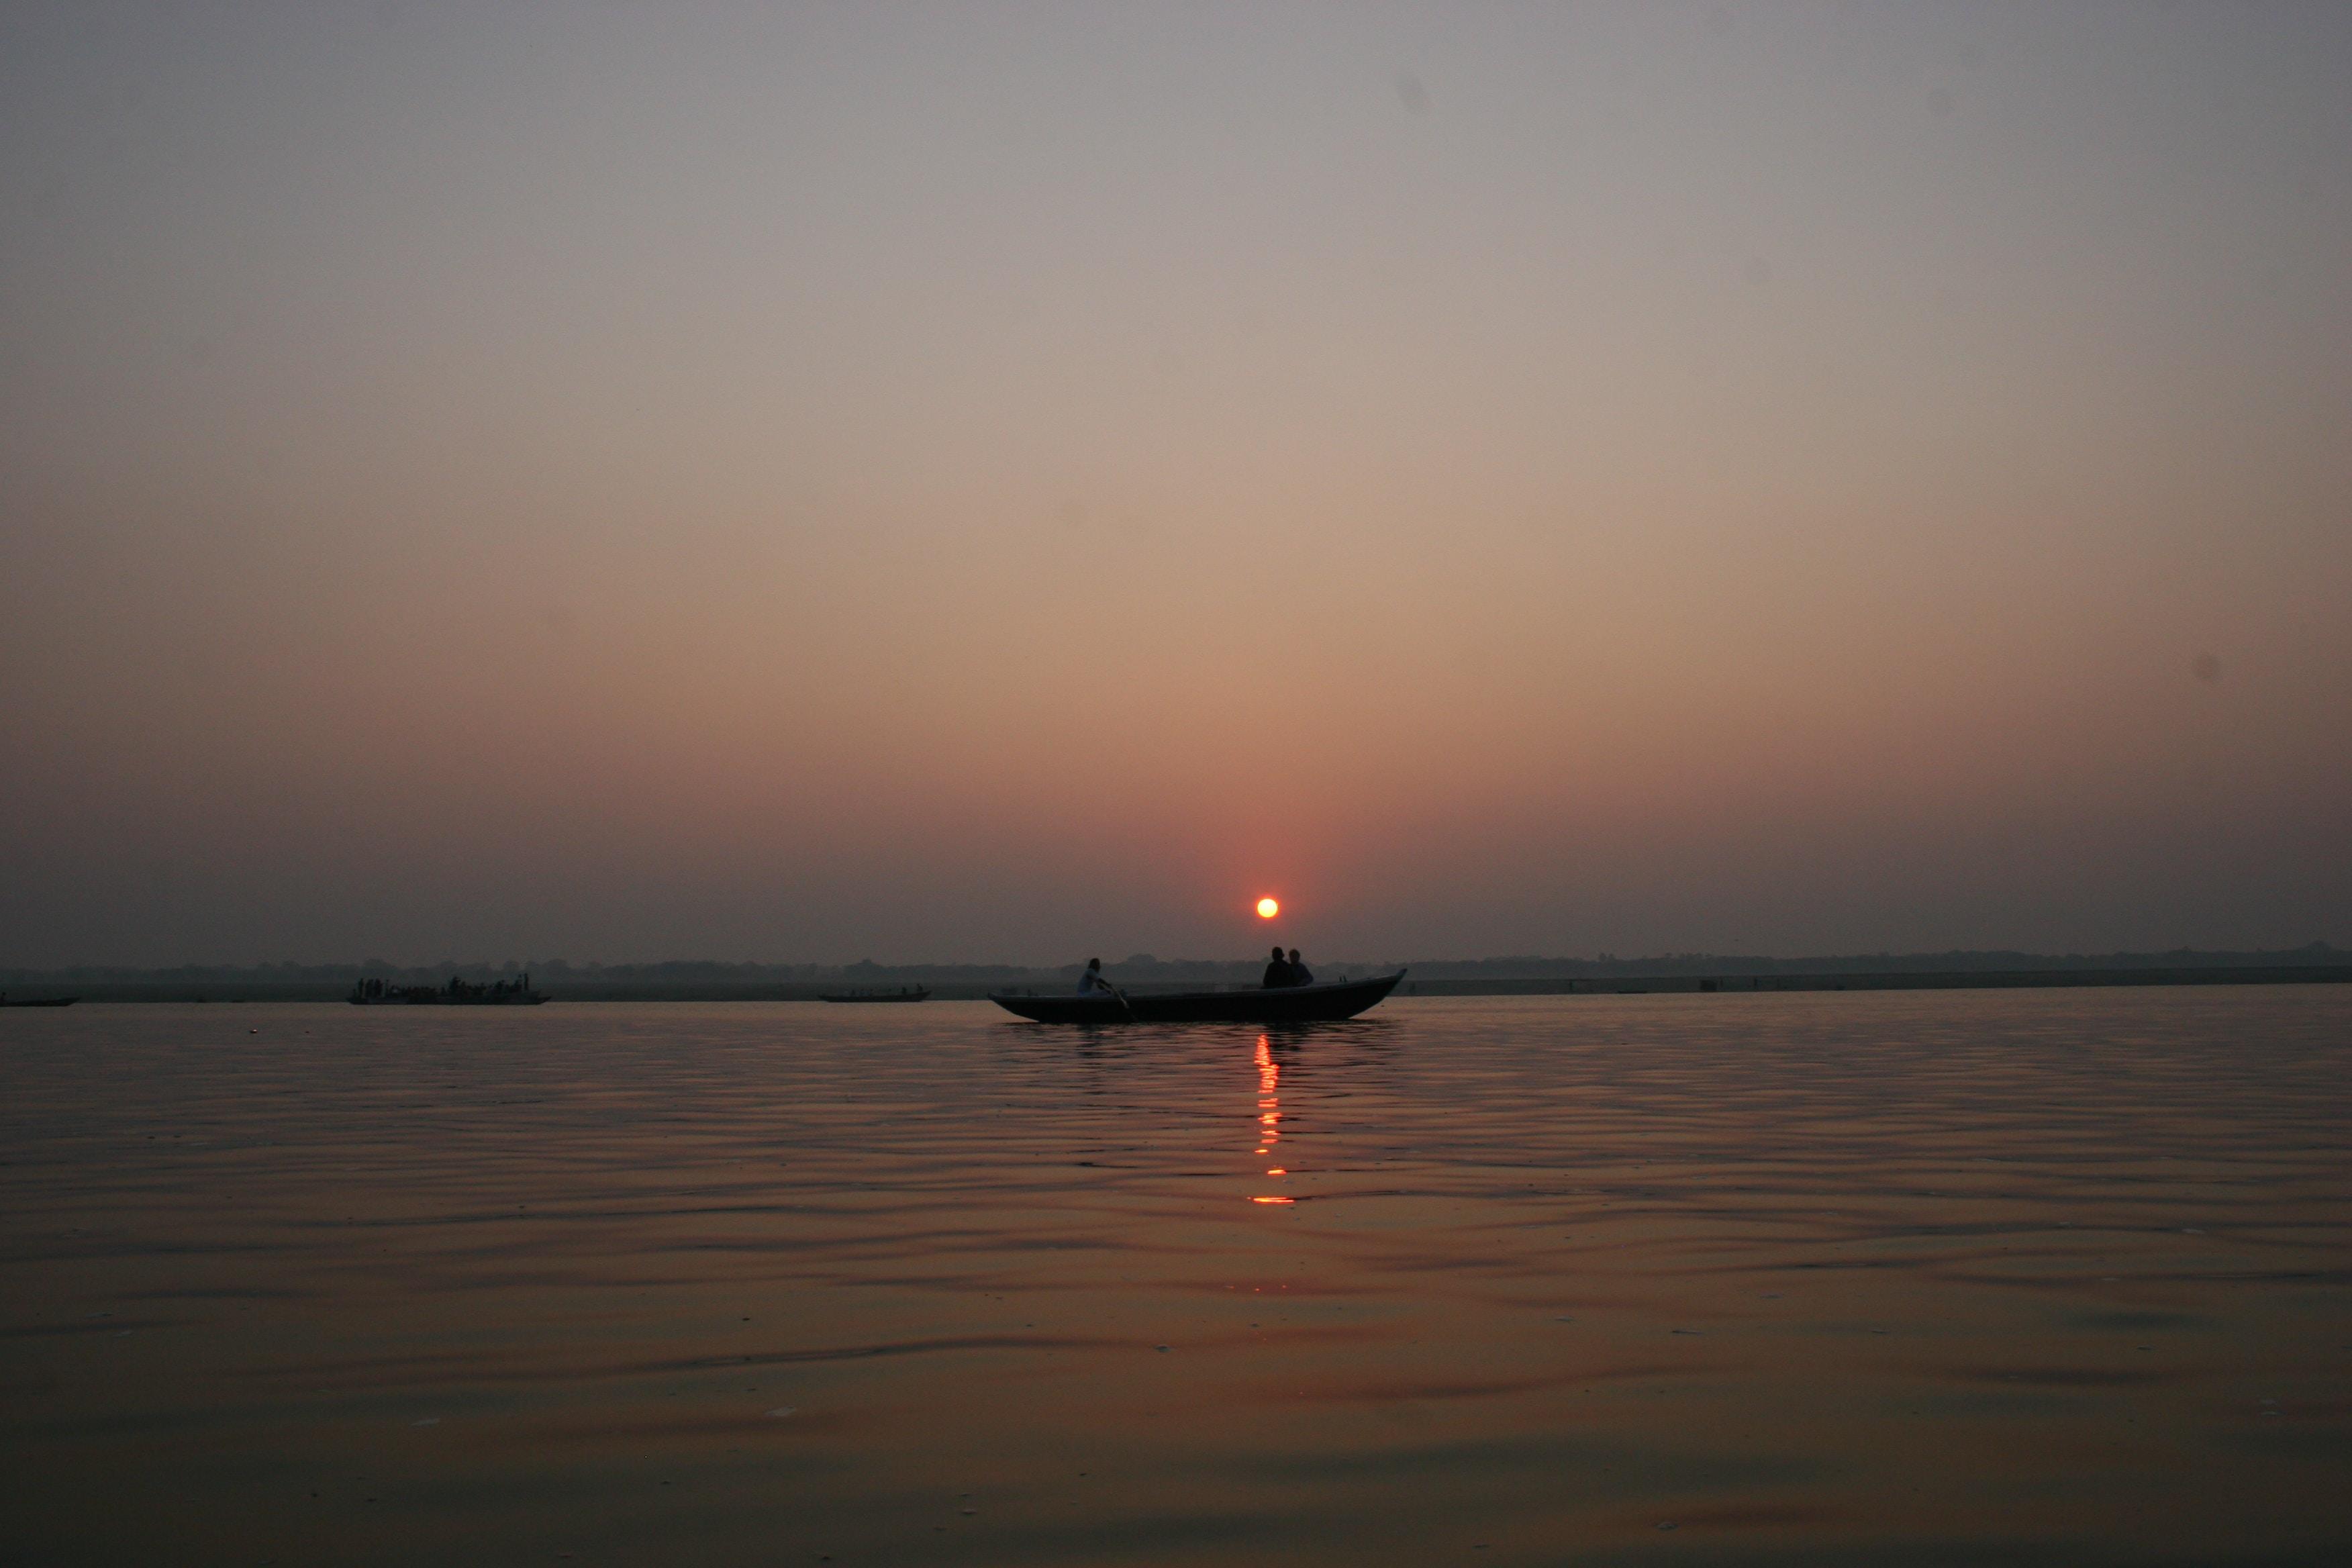 Free Unsplash photo from Srinivas  Bala